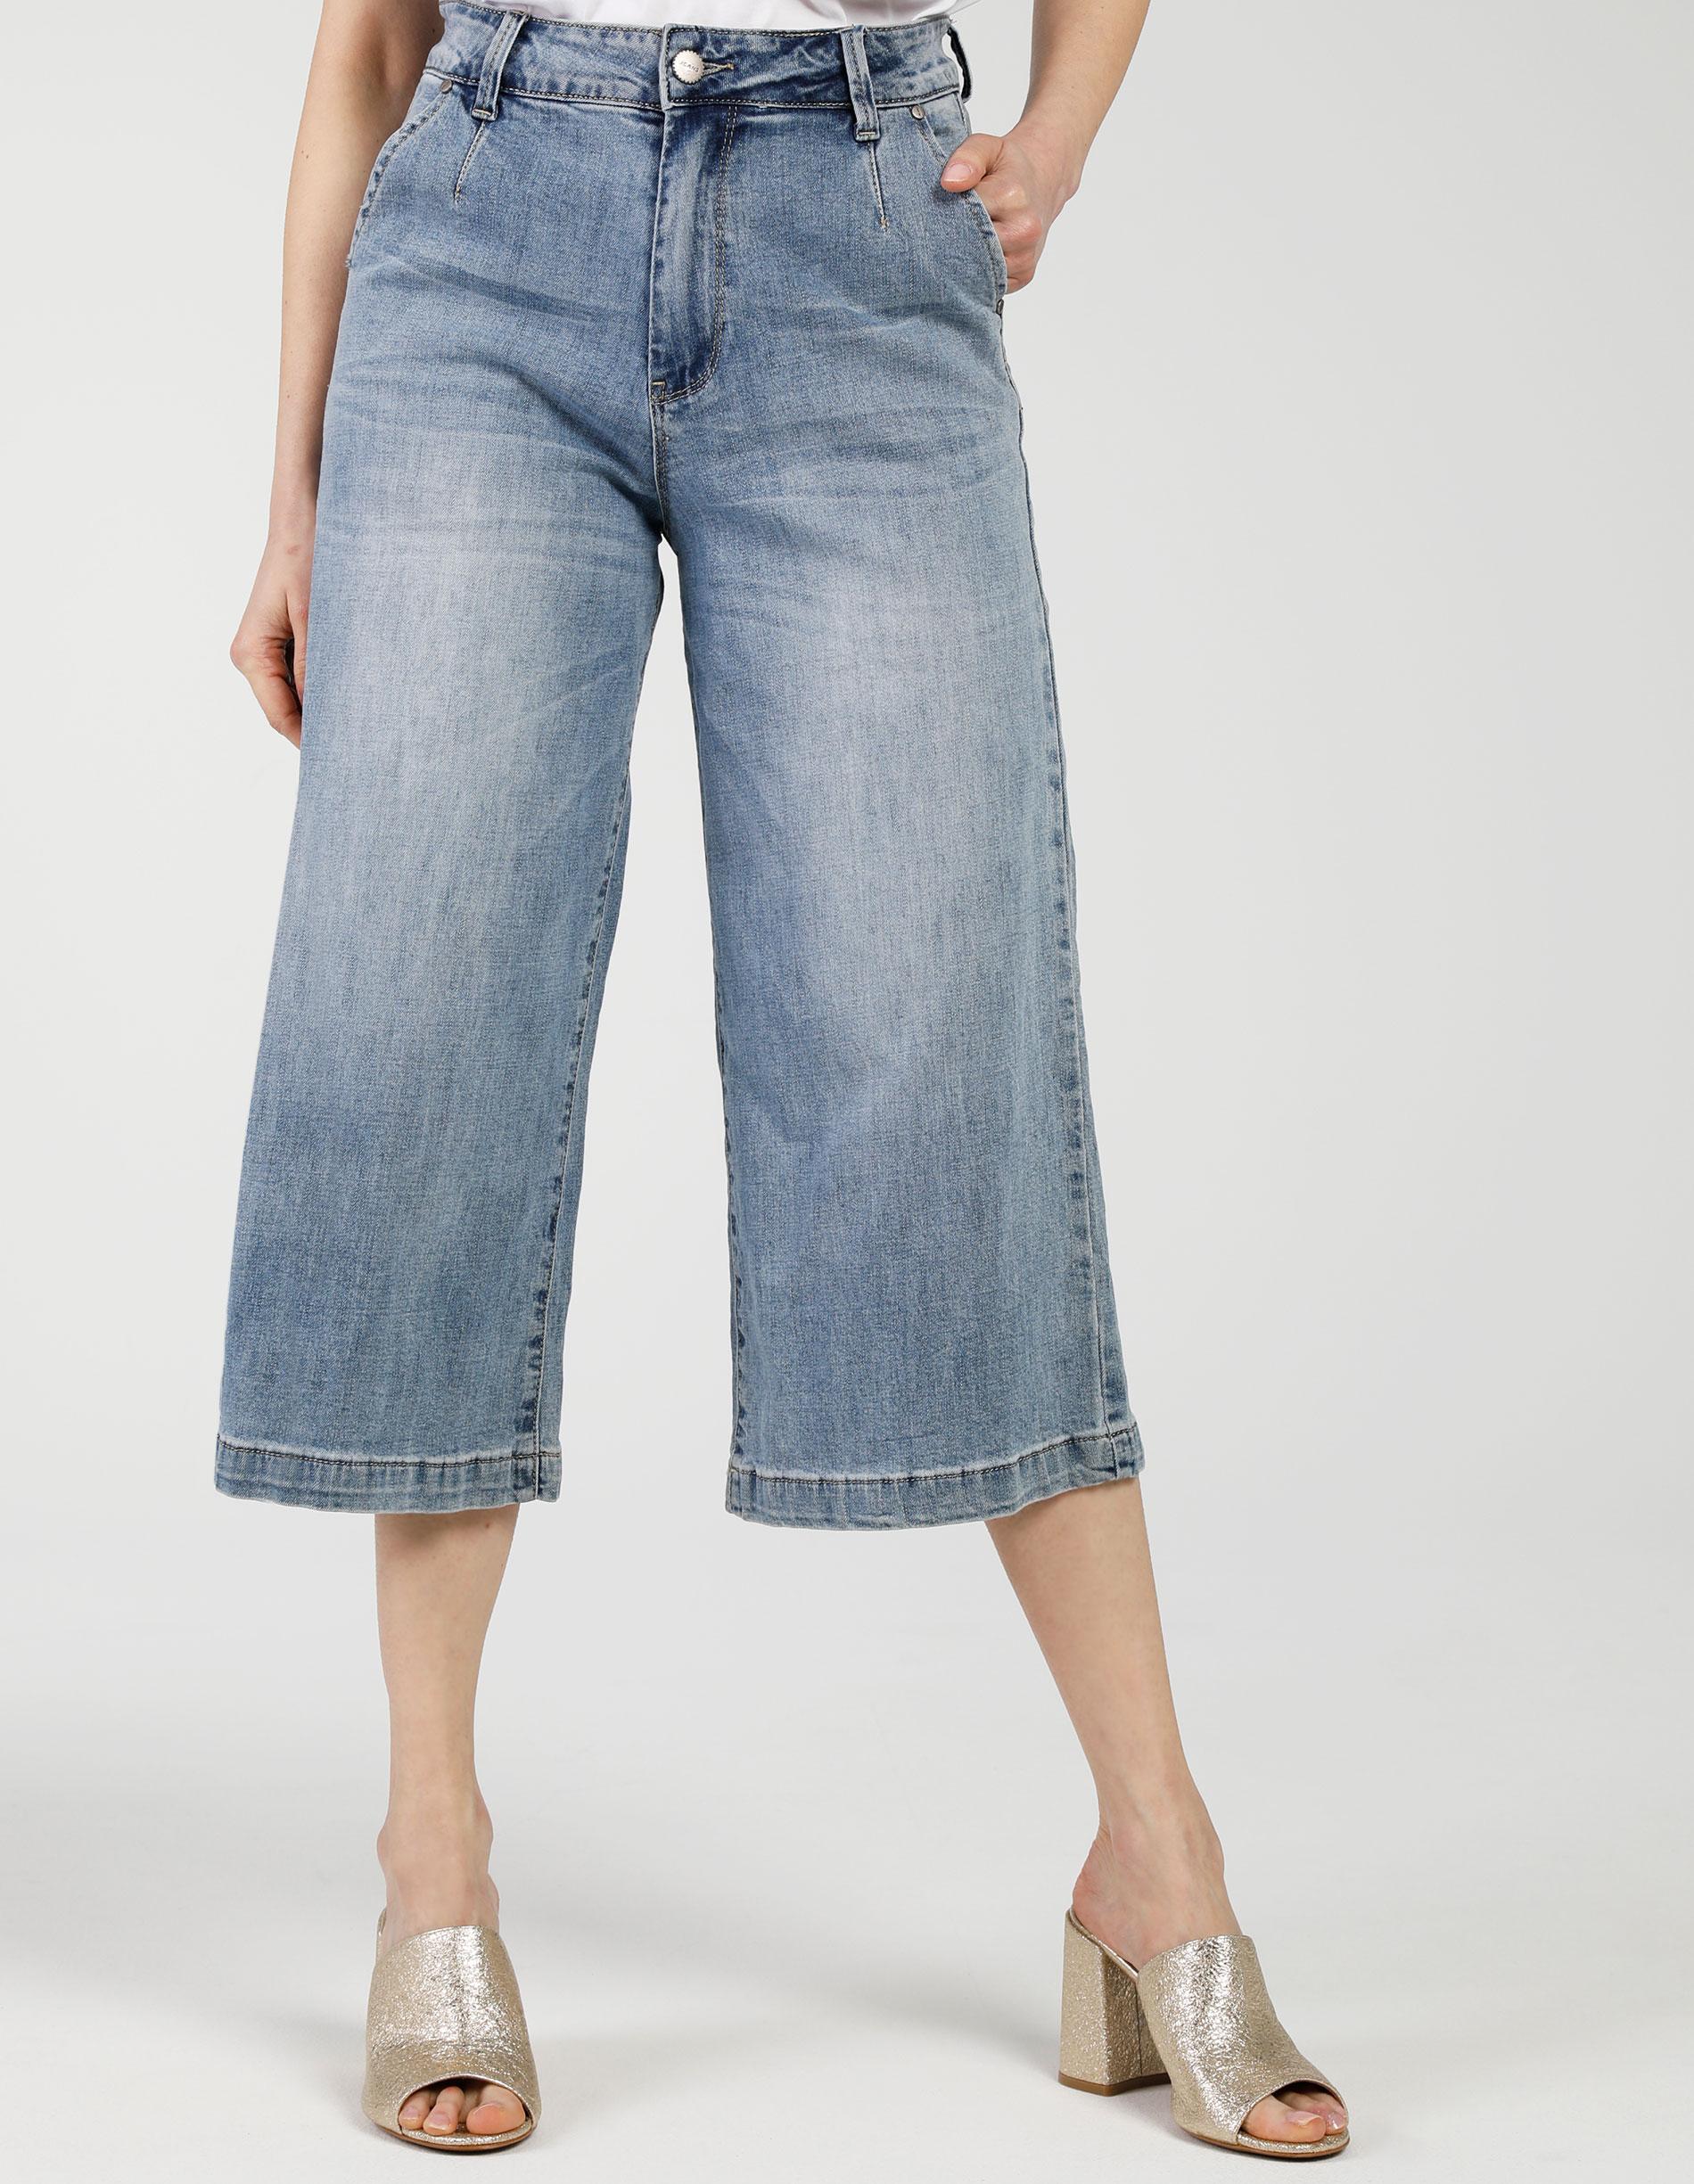 Spodnie - 92-ML1412 JEA - Unisono